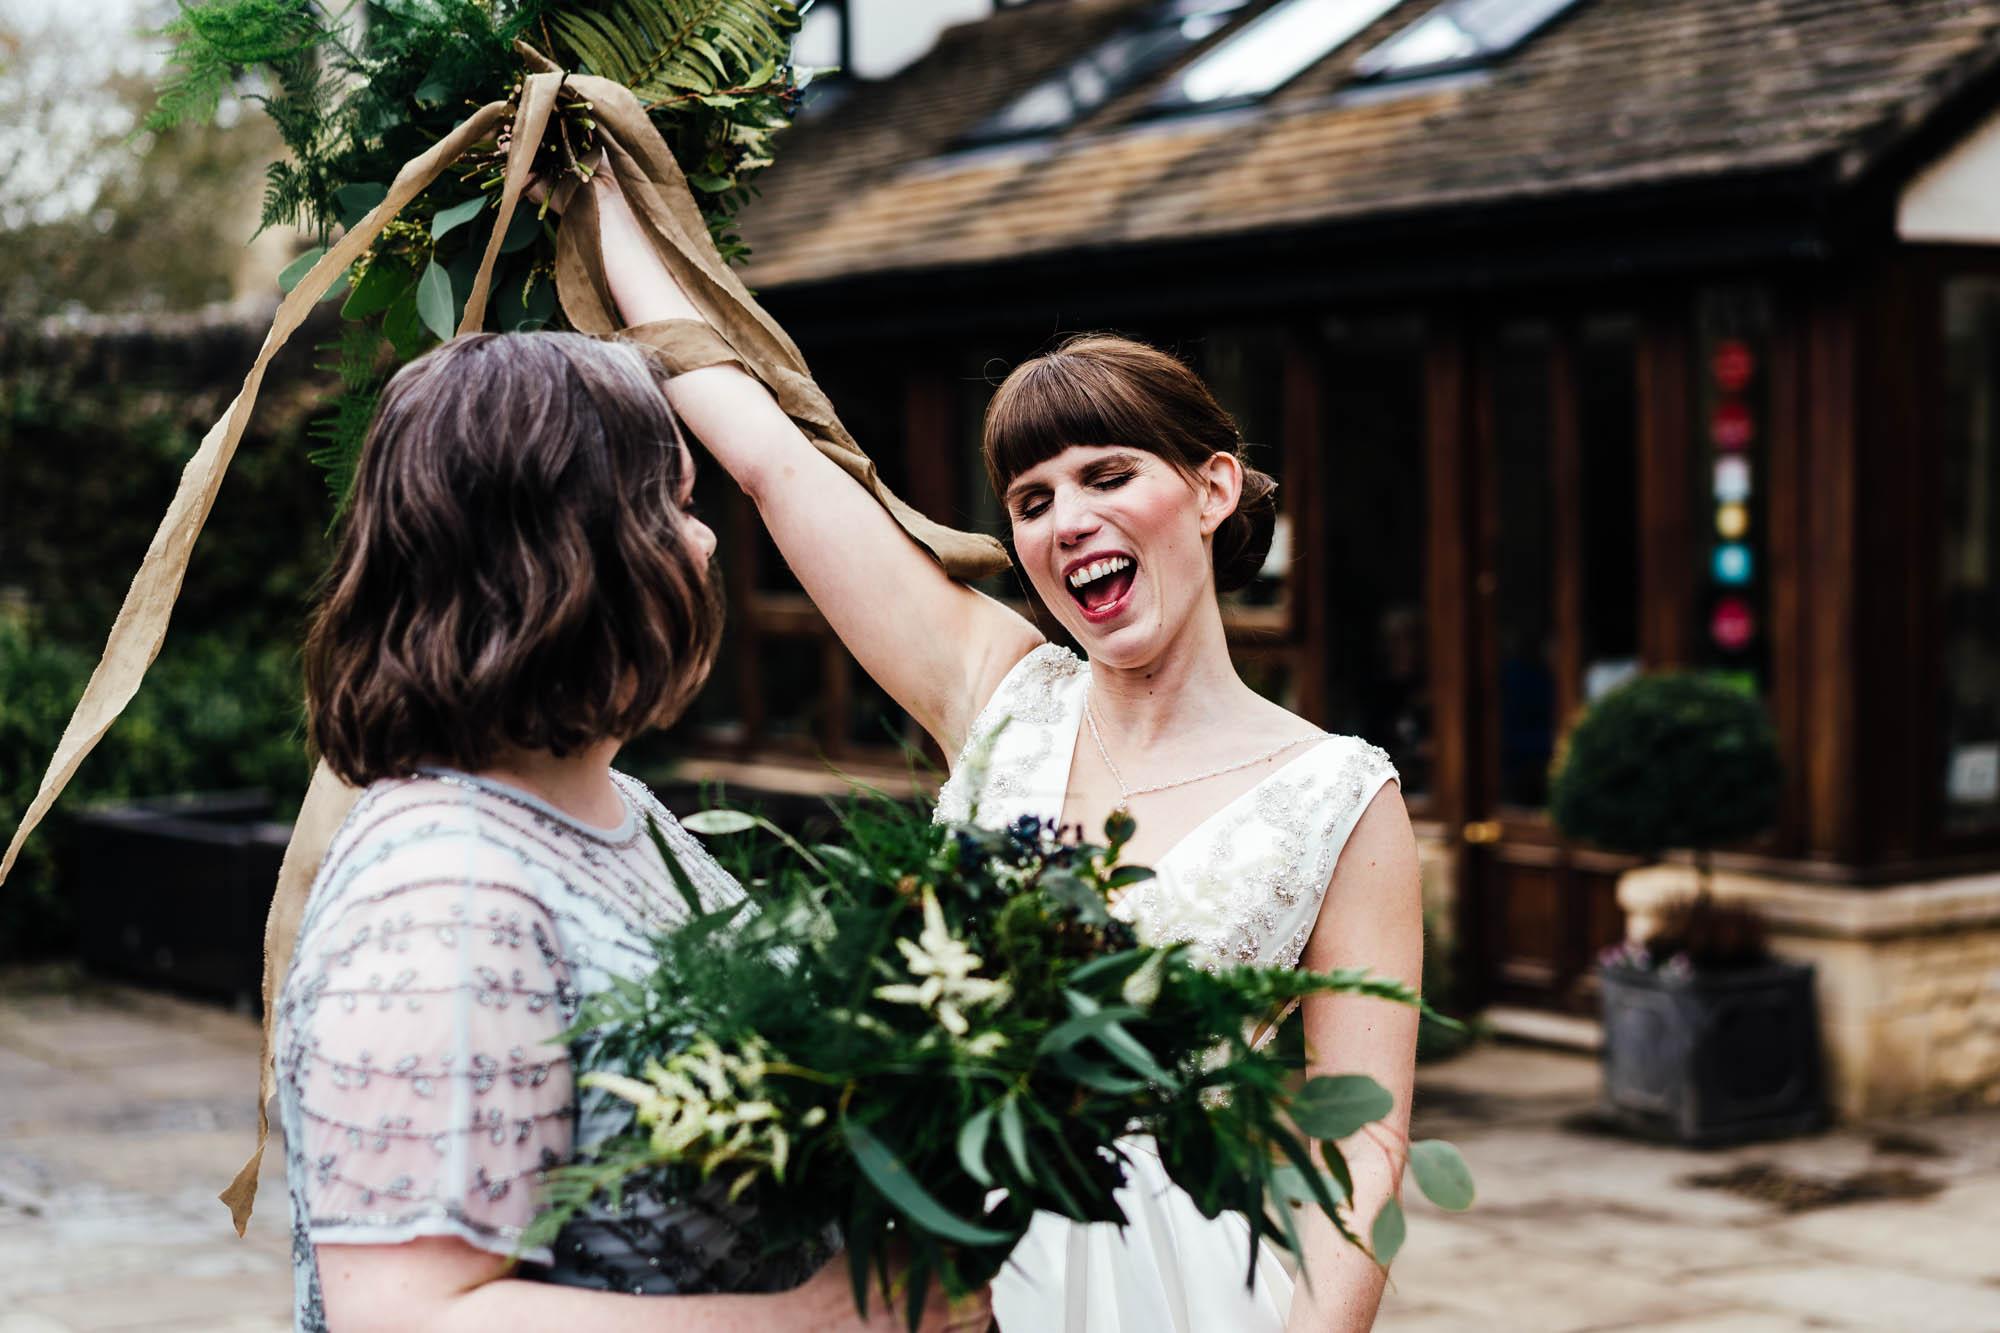 william-cecil-stamford-wedding-34